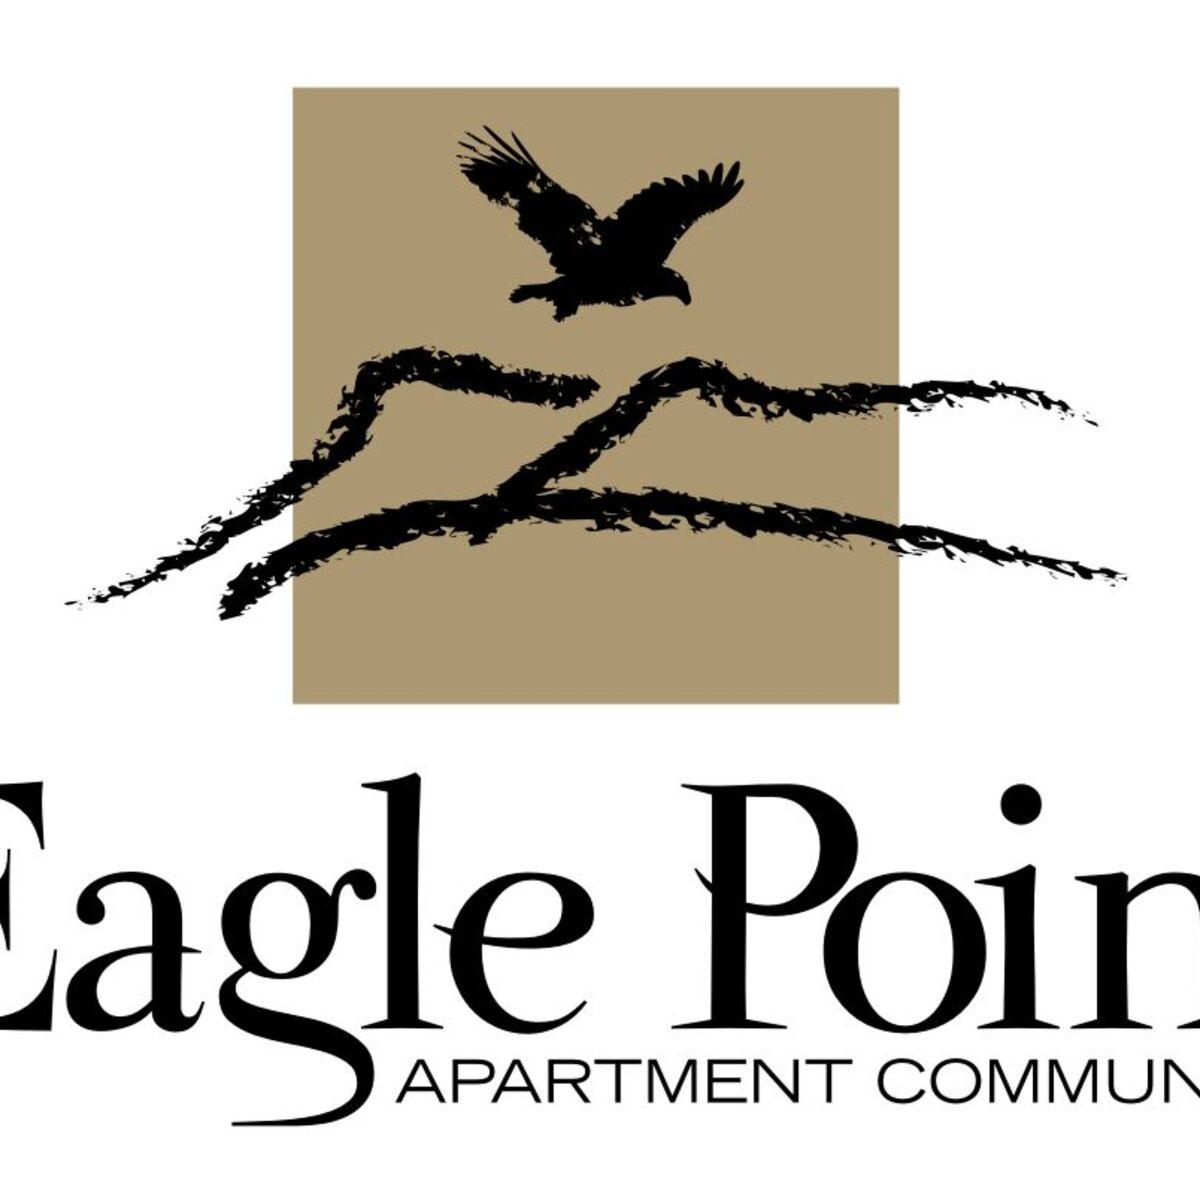 Eagle Point Apartments: Cheney Apartments In Washington